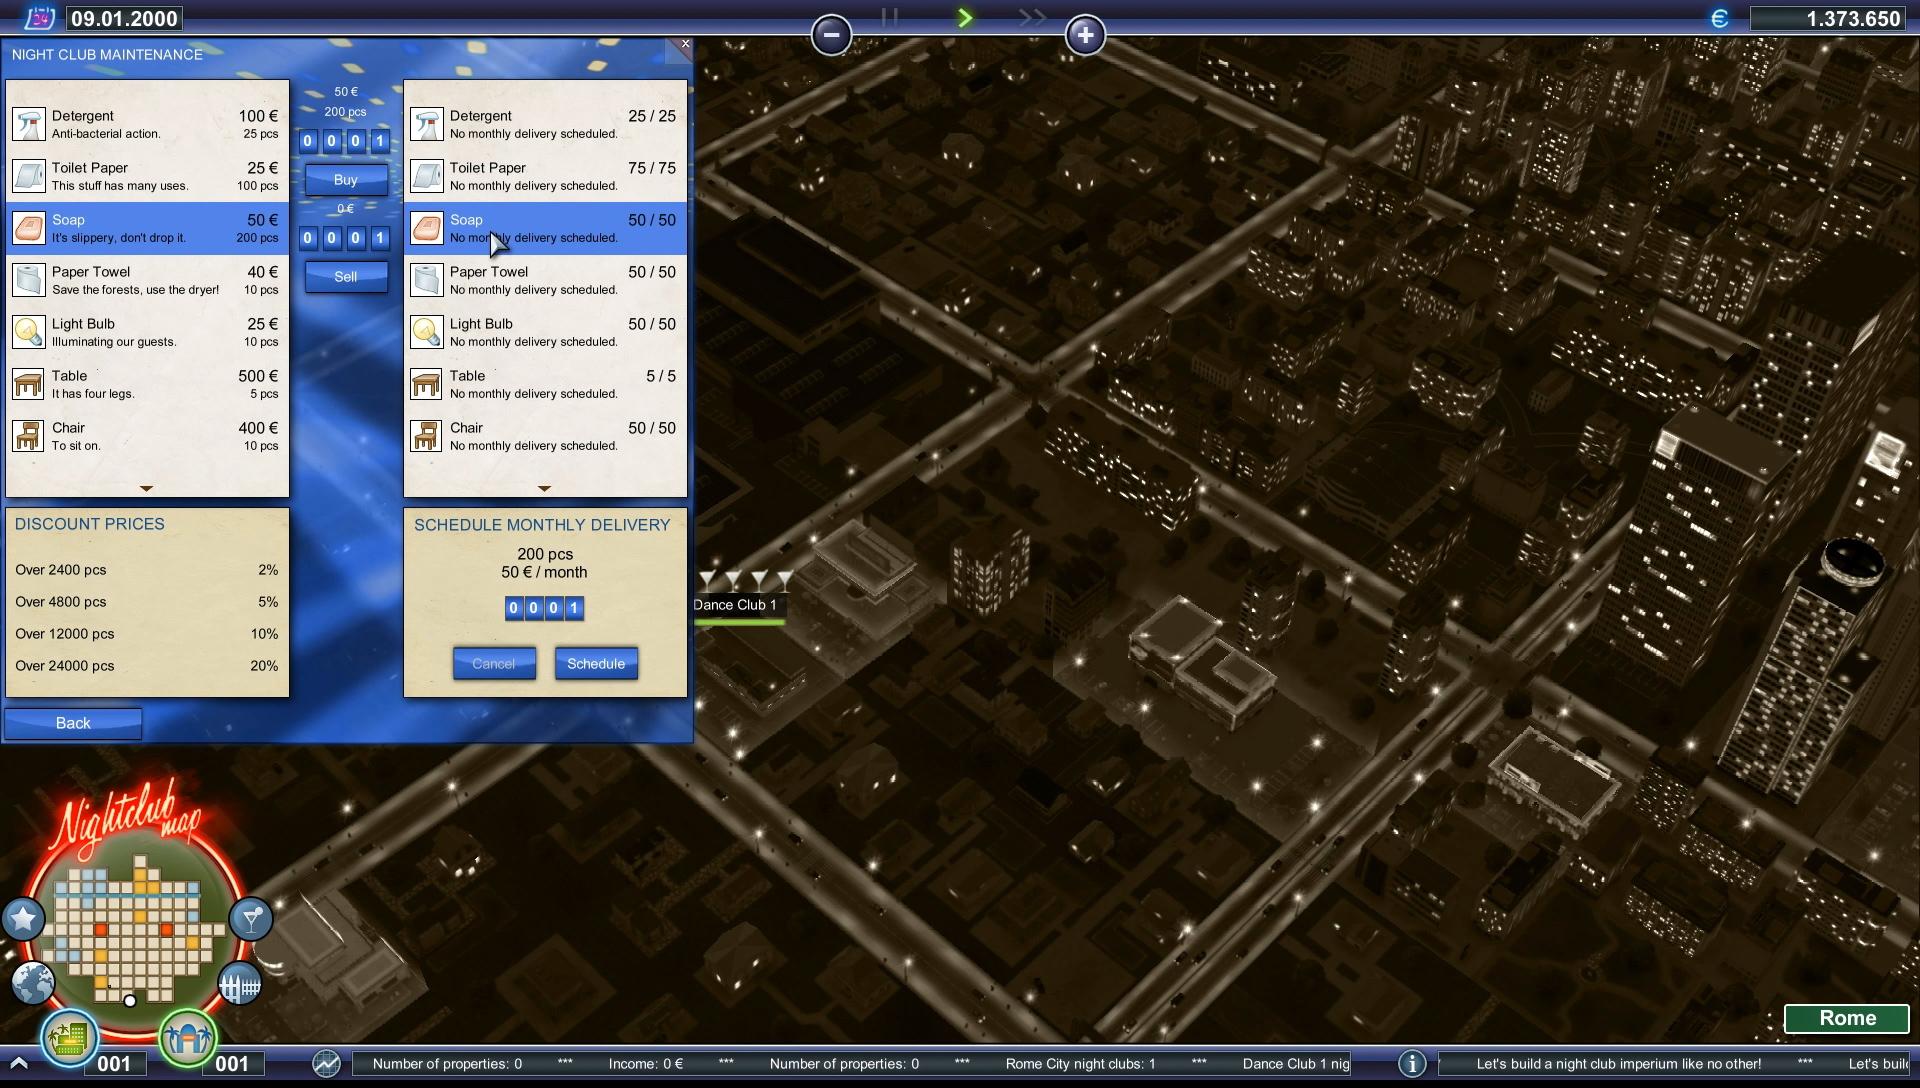 Nightclub Emporium screenshot